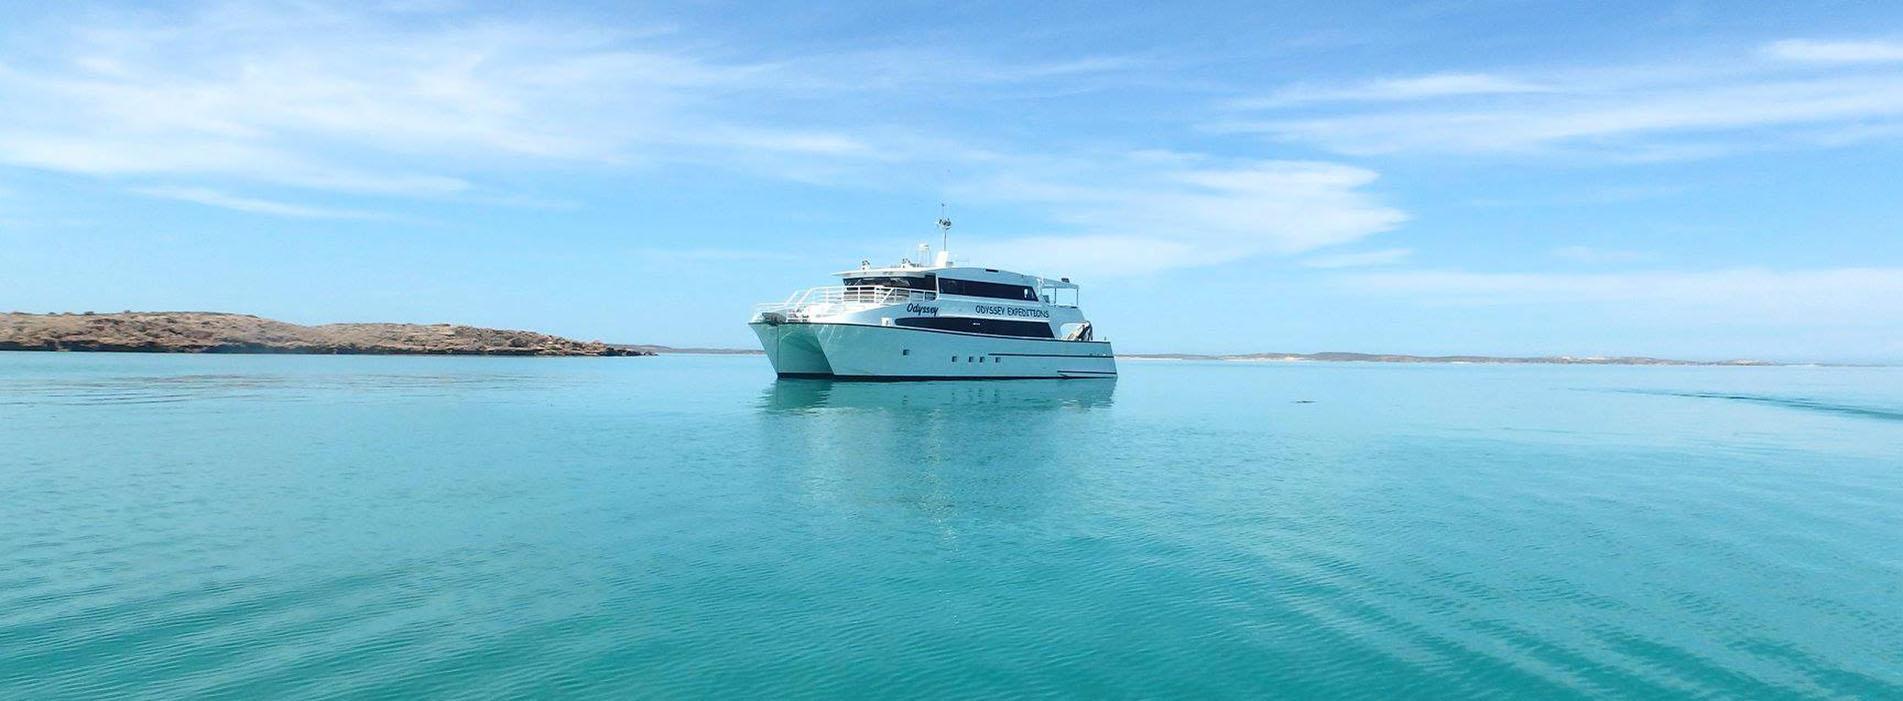 ODYSSEY-side-profile-Kimberley-turquoise-water